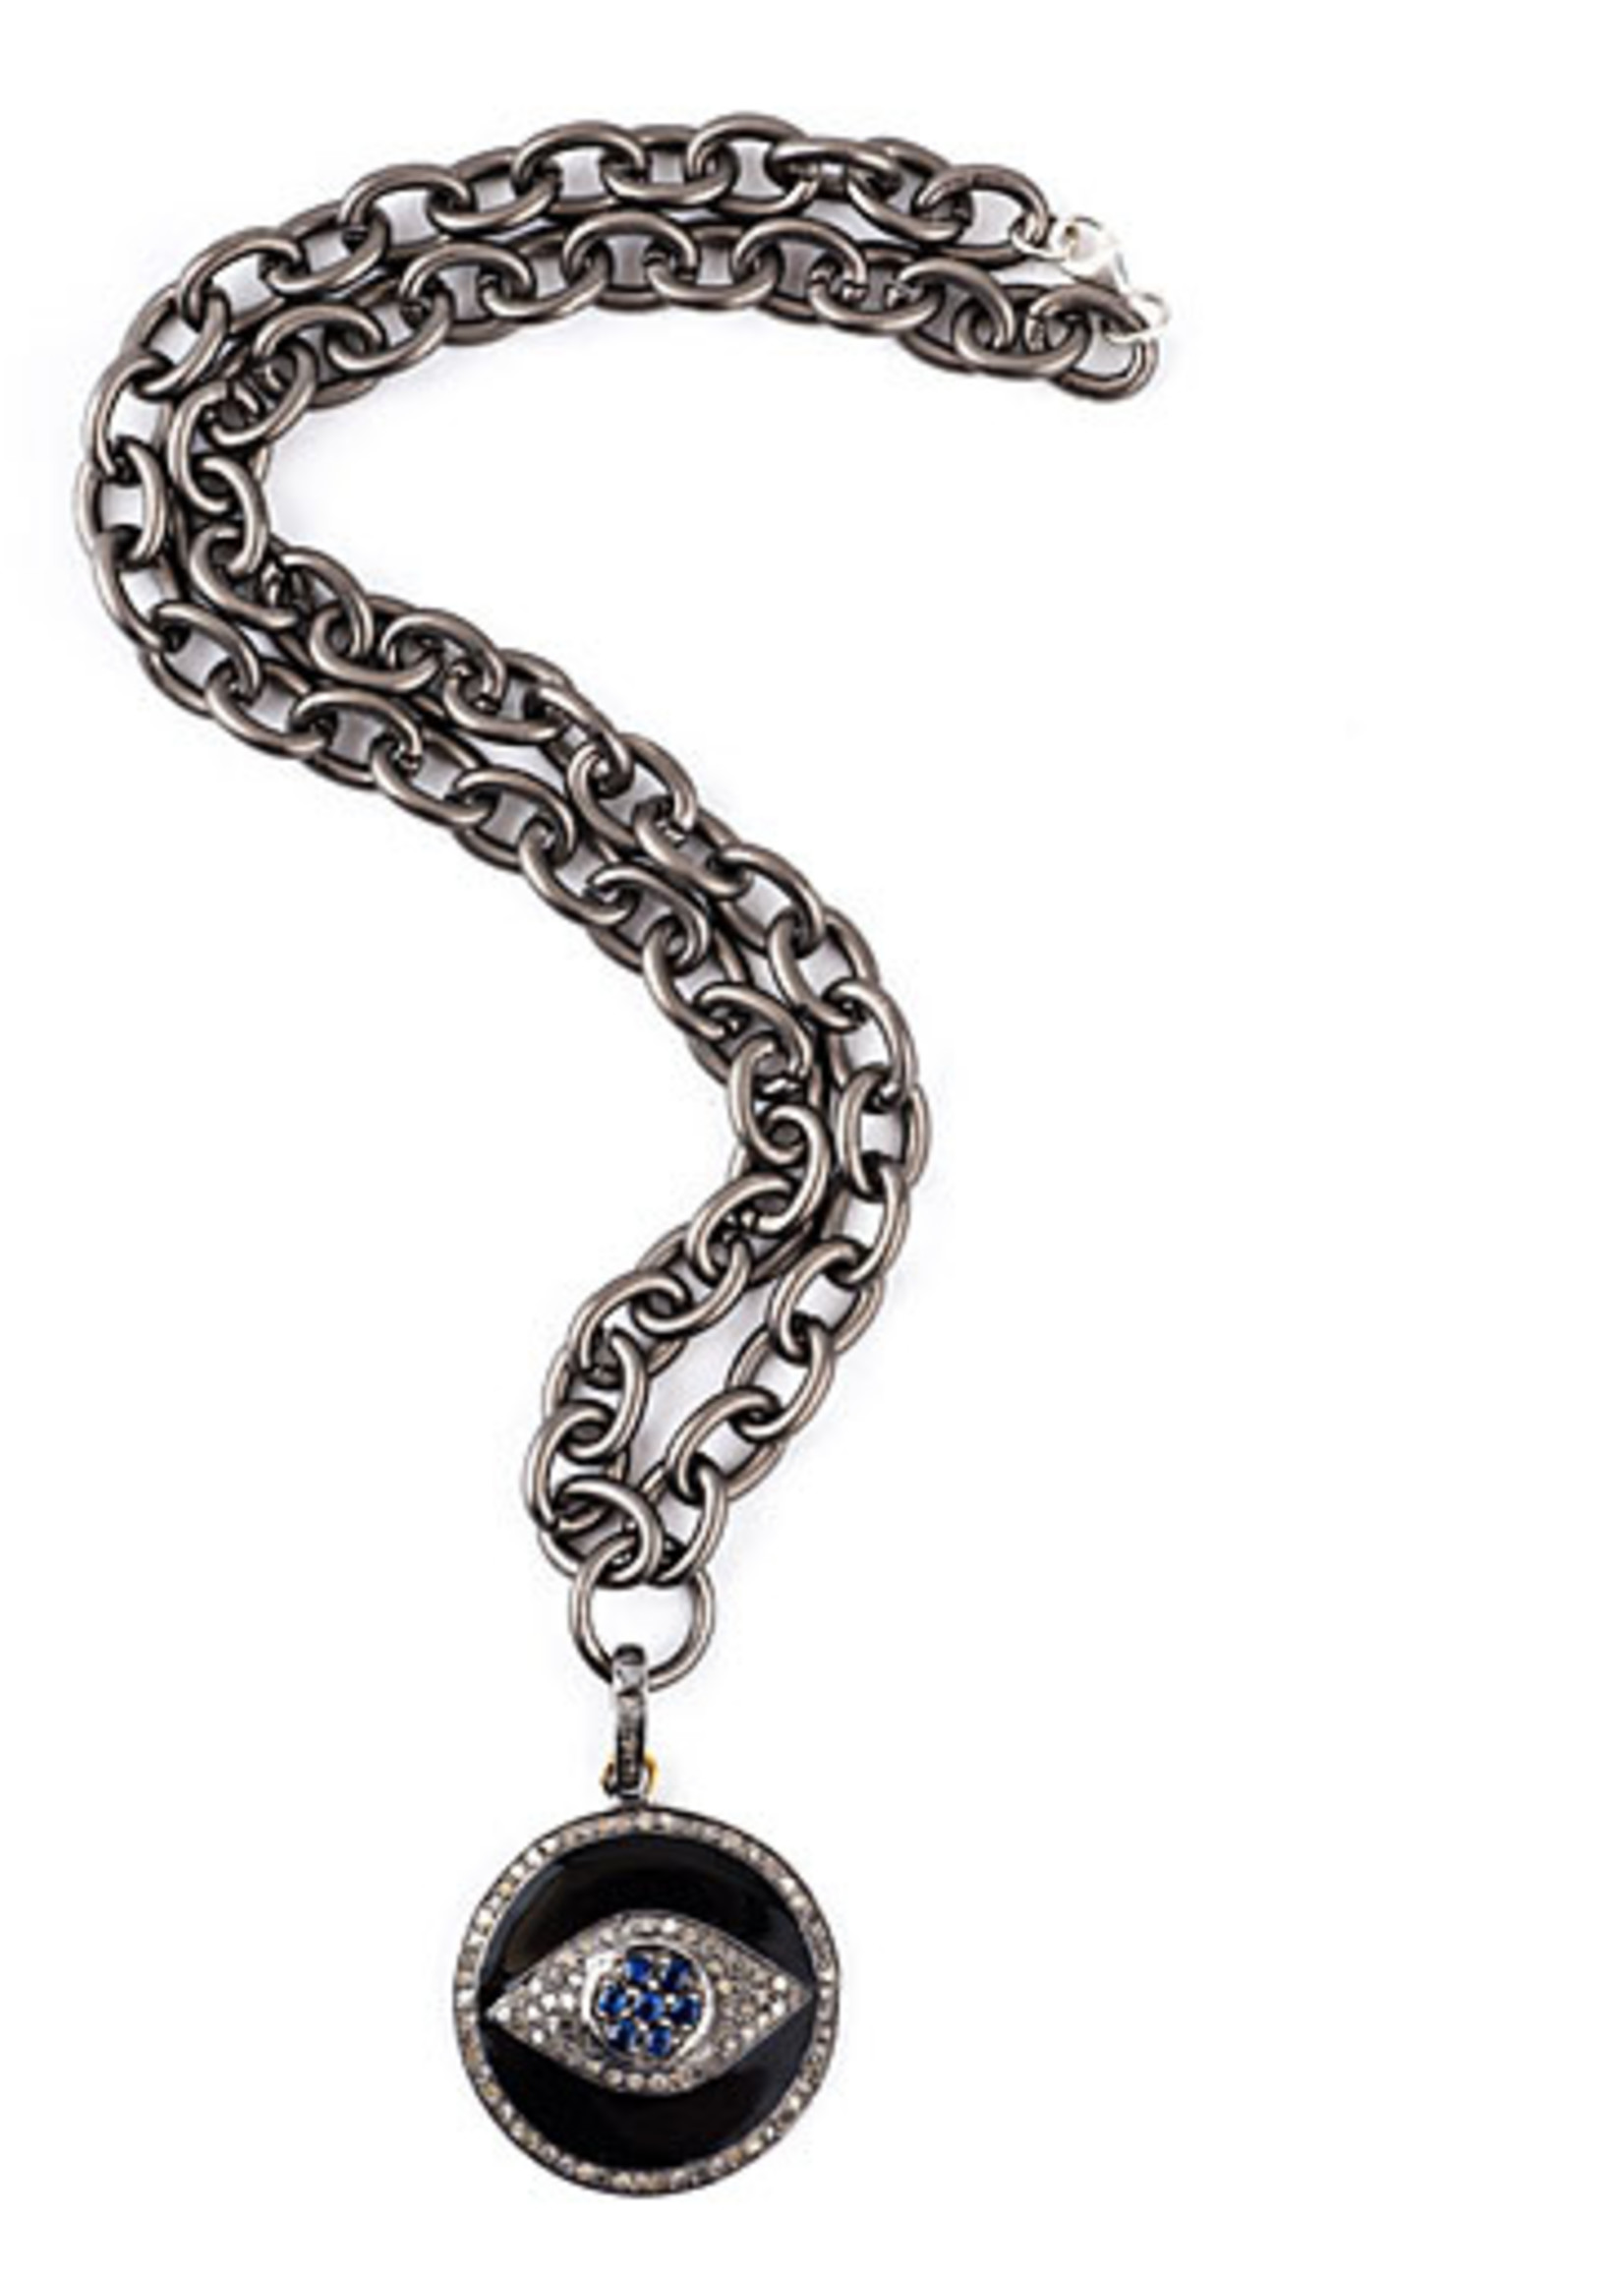 Mina Danielle Black Enamel & Diamond Evil Eye Pendant on Oxidized link chain